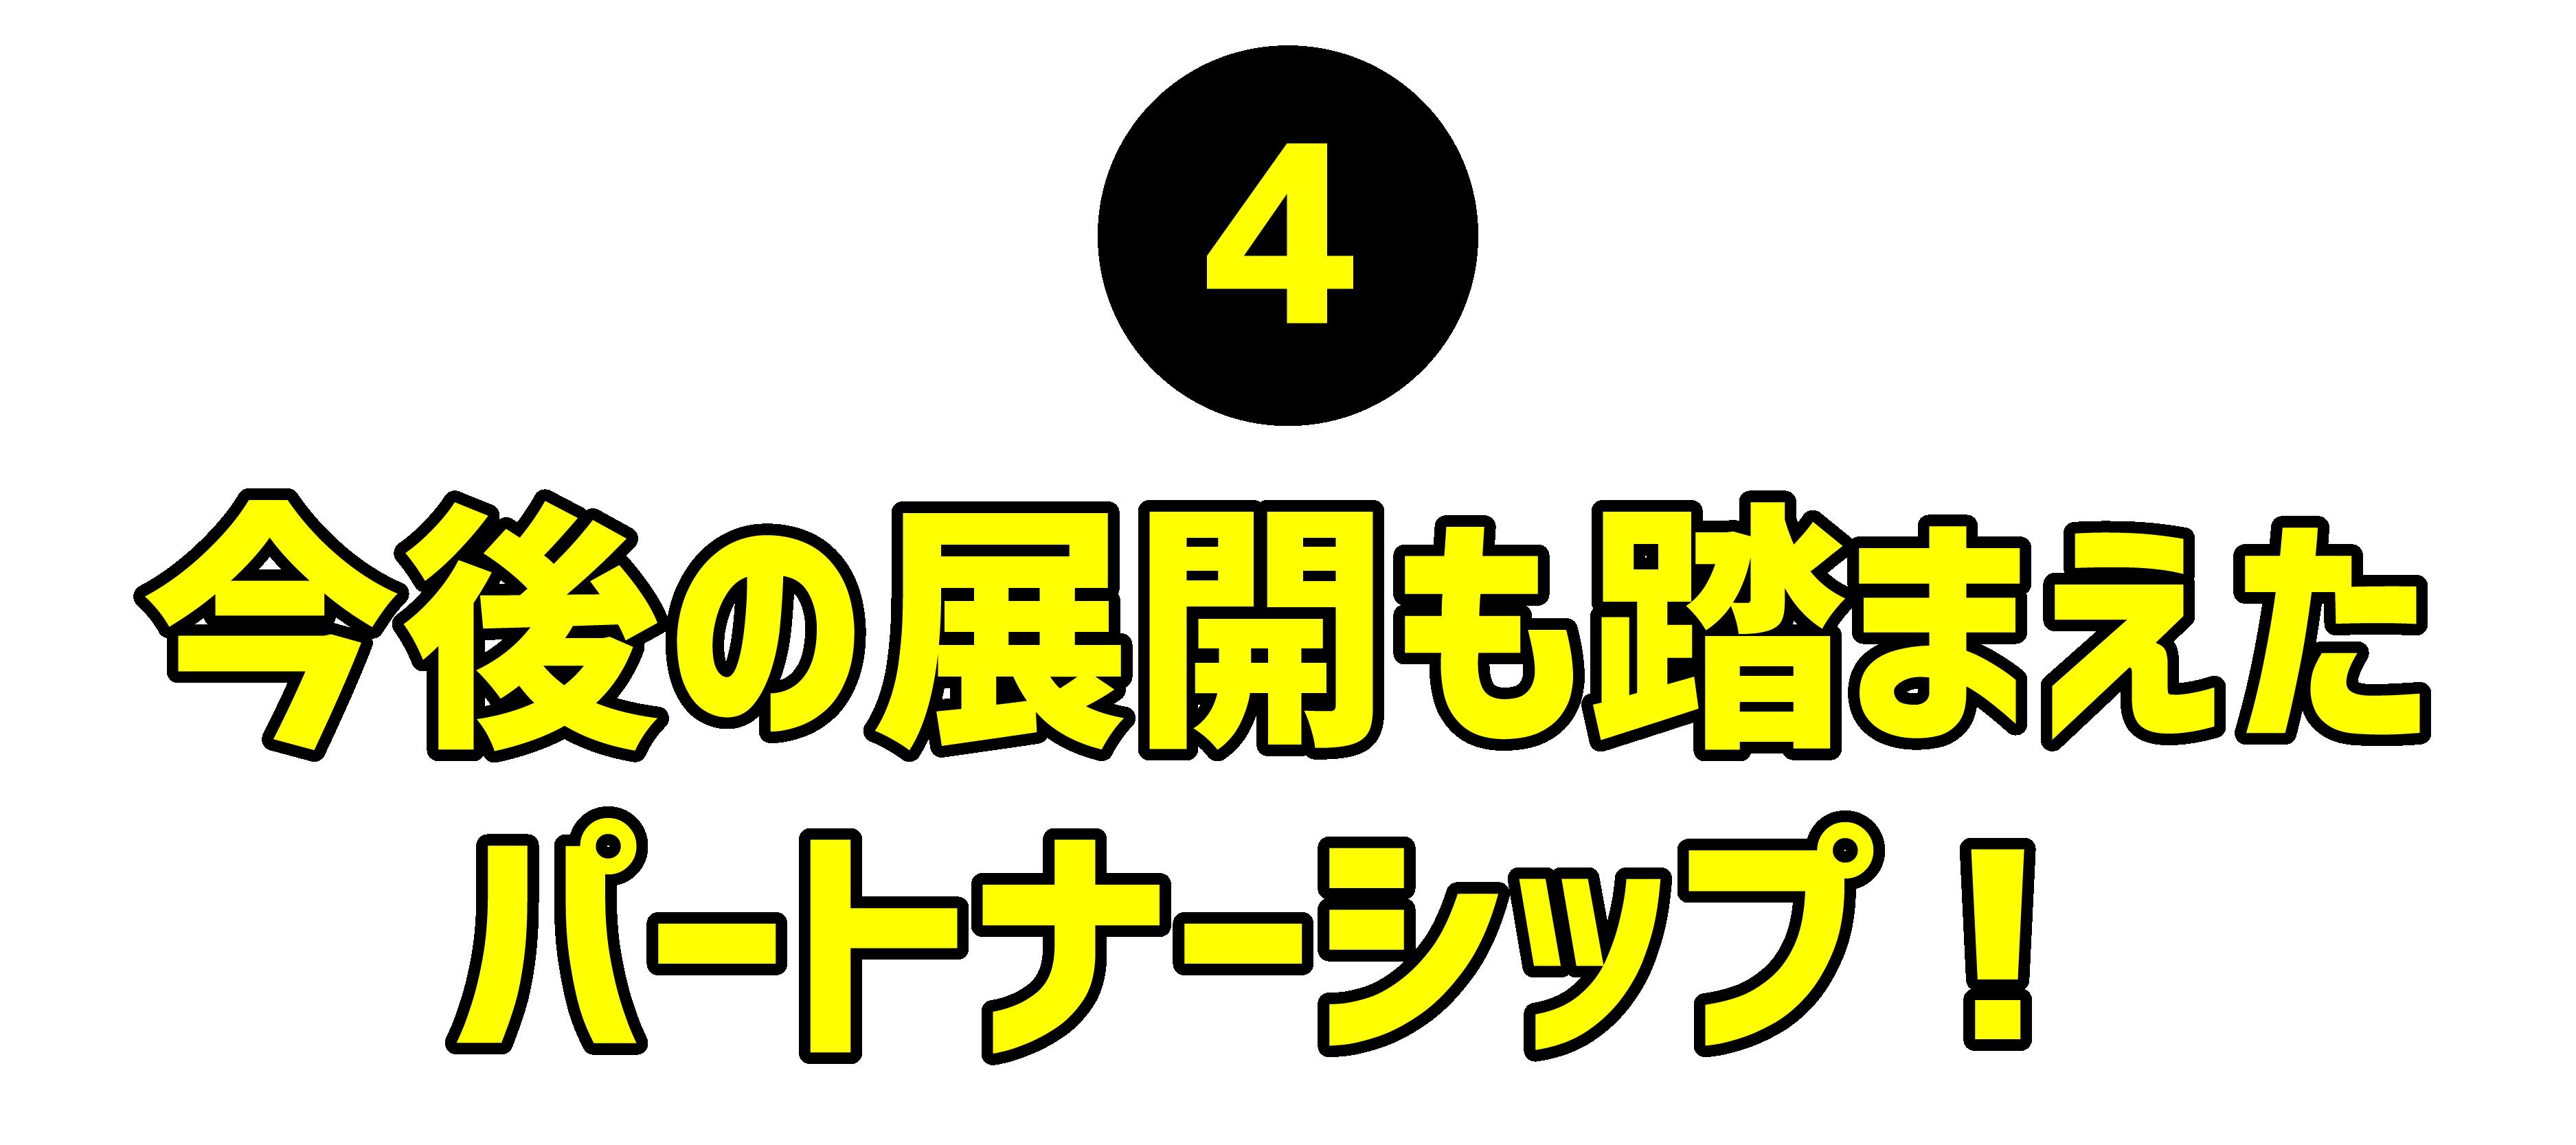 lp_text_02-04